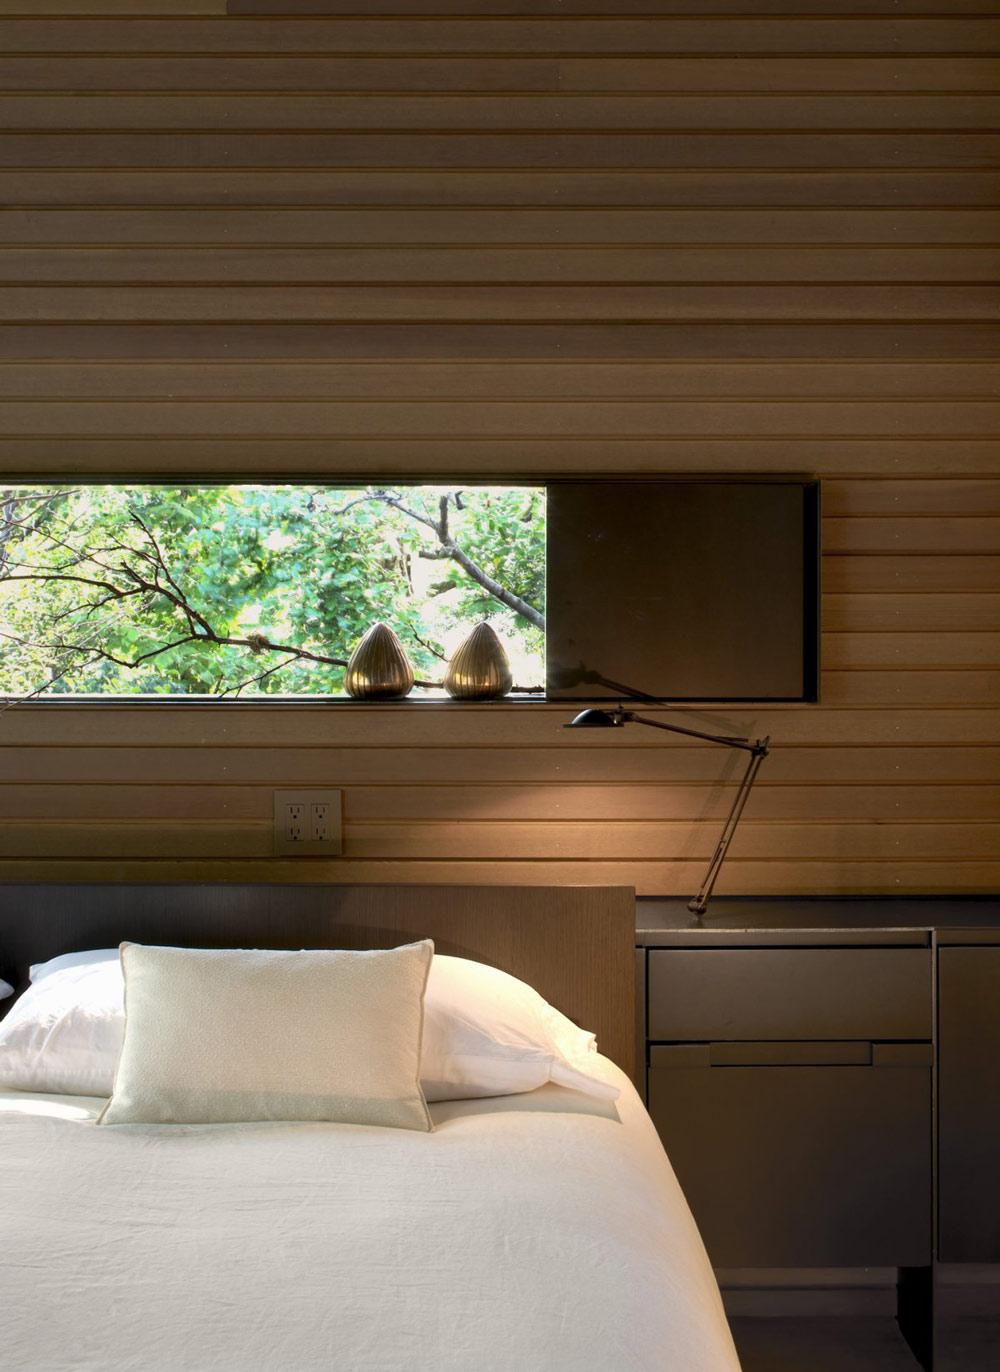 Bedroom, Urban Cabin in Medina, Washington by Suyama Peterson Deguchi